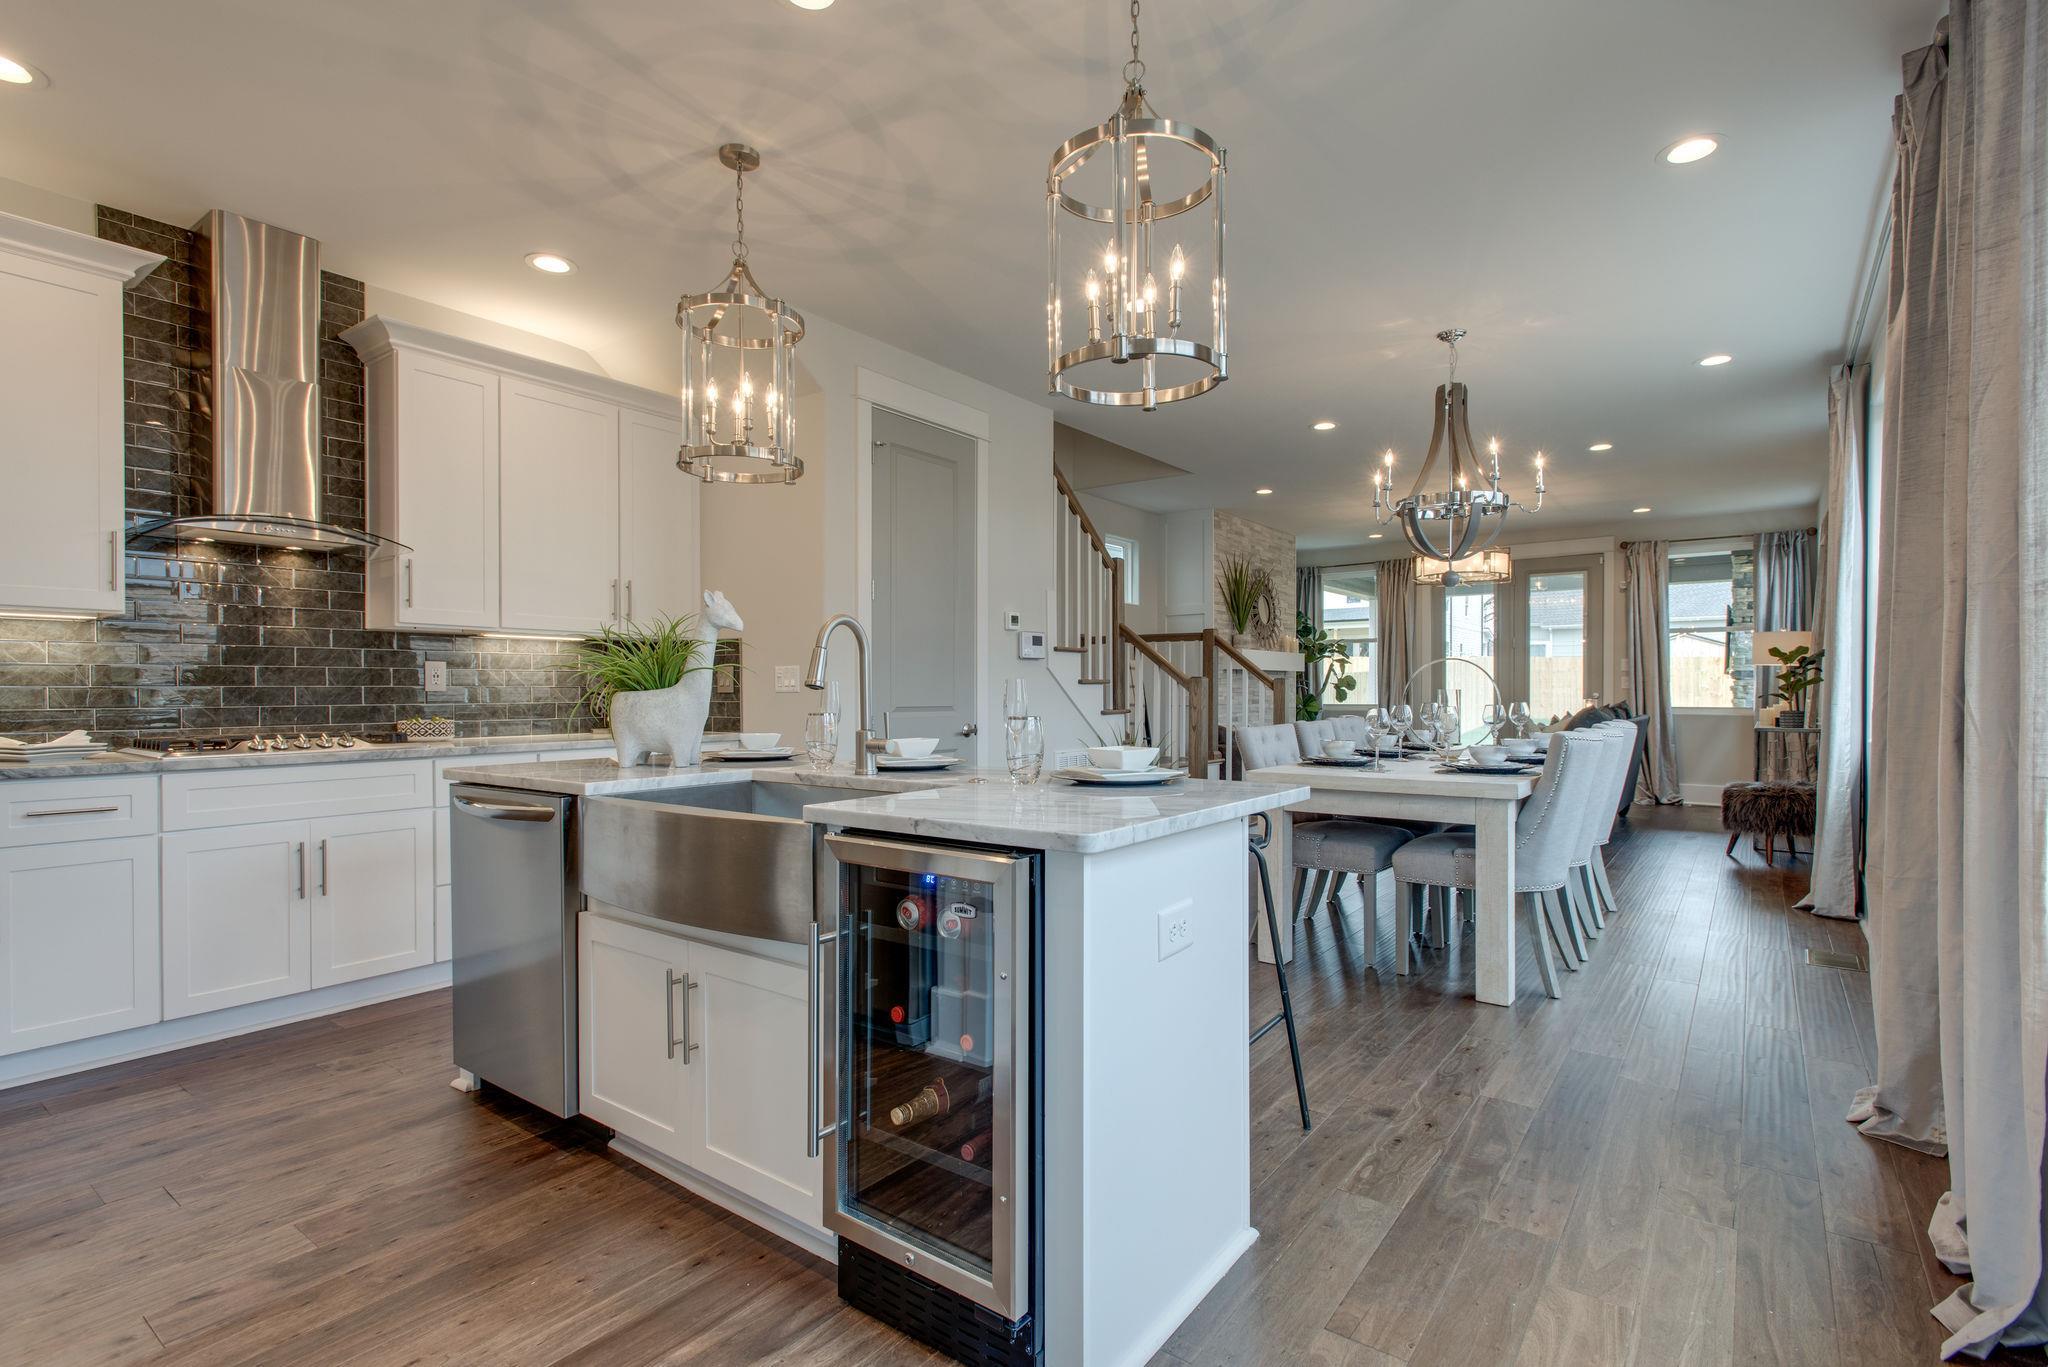 905B Delmas Ave, Nashville, TN 37216 - Nashville, TN real estate listing